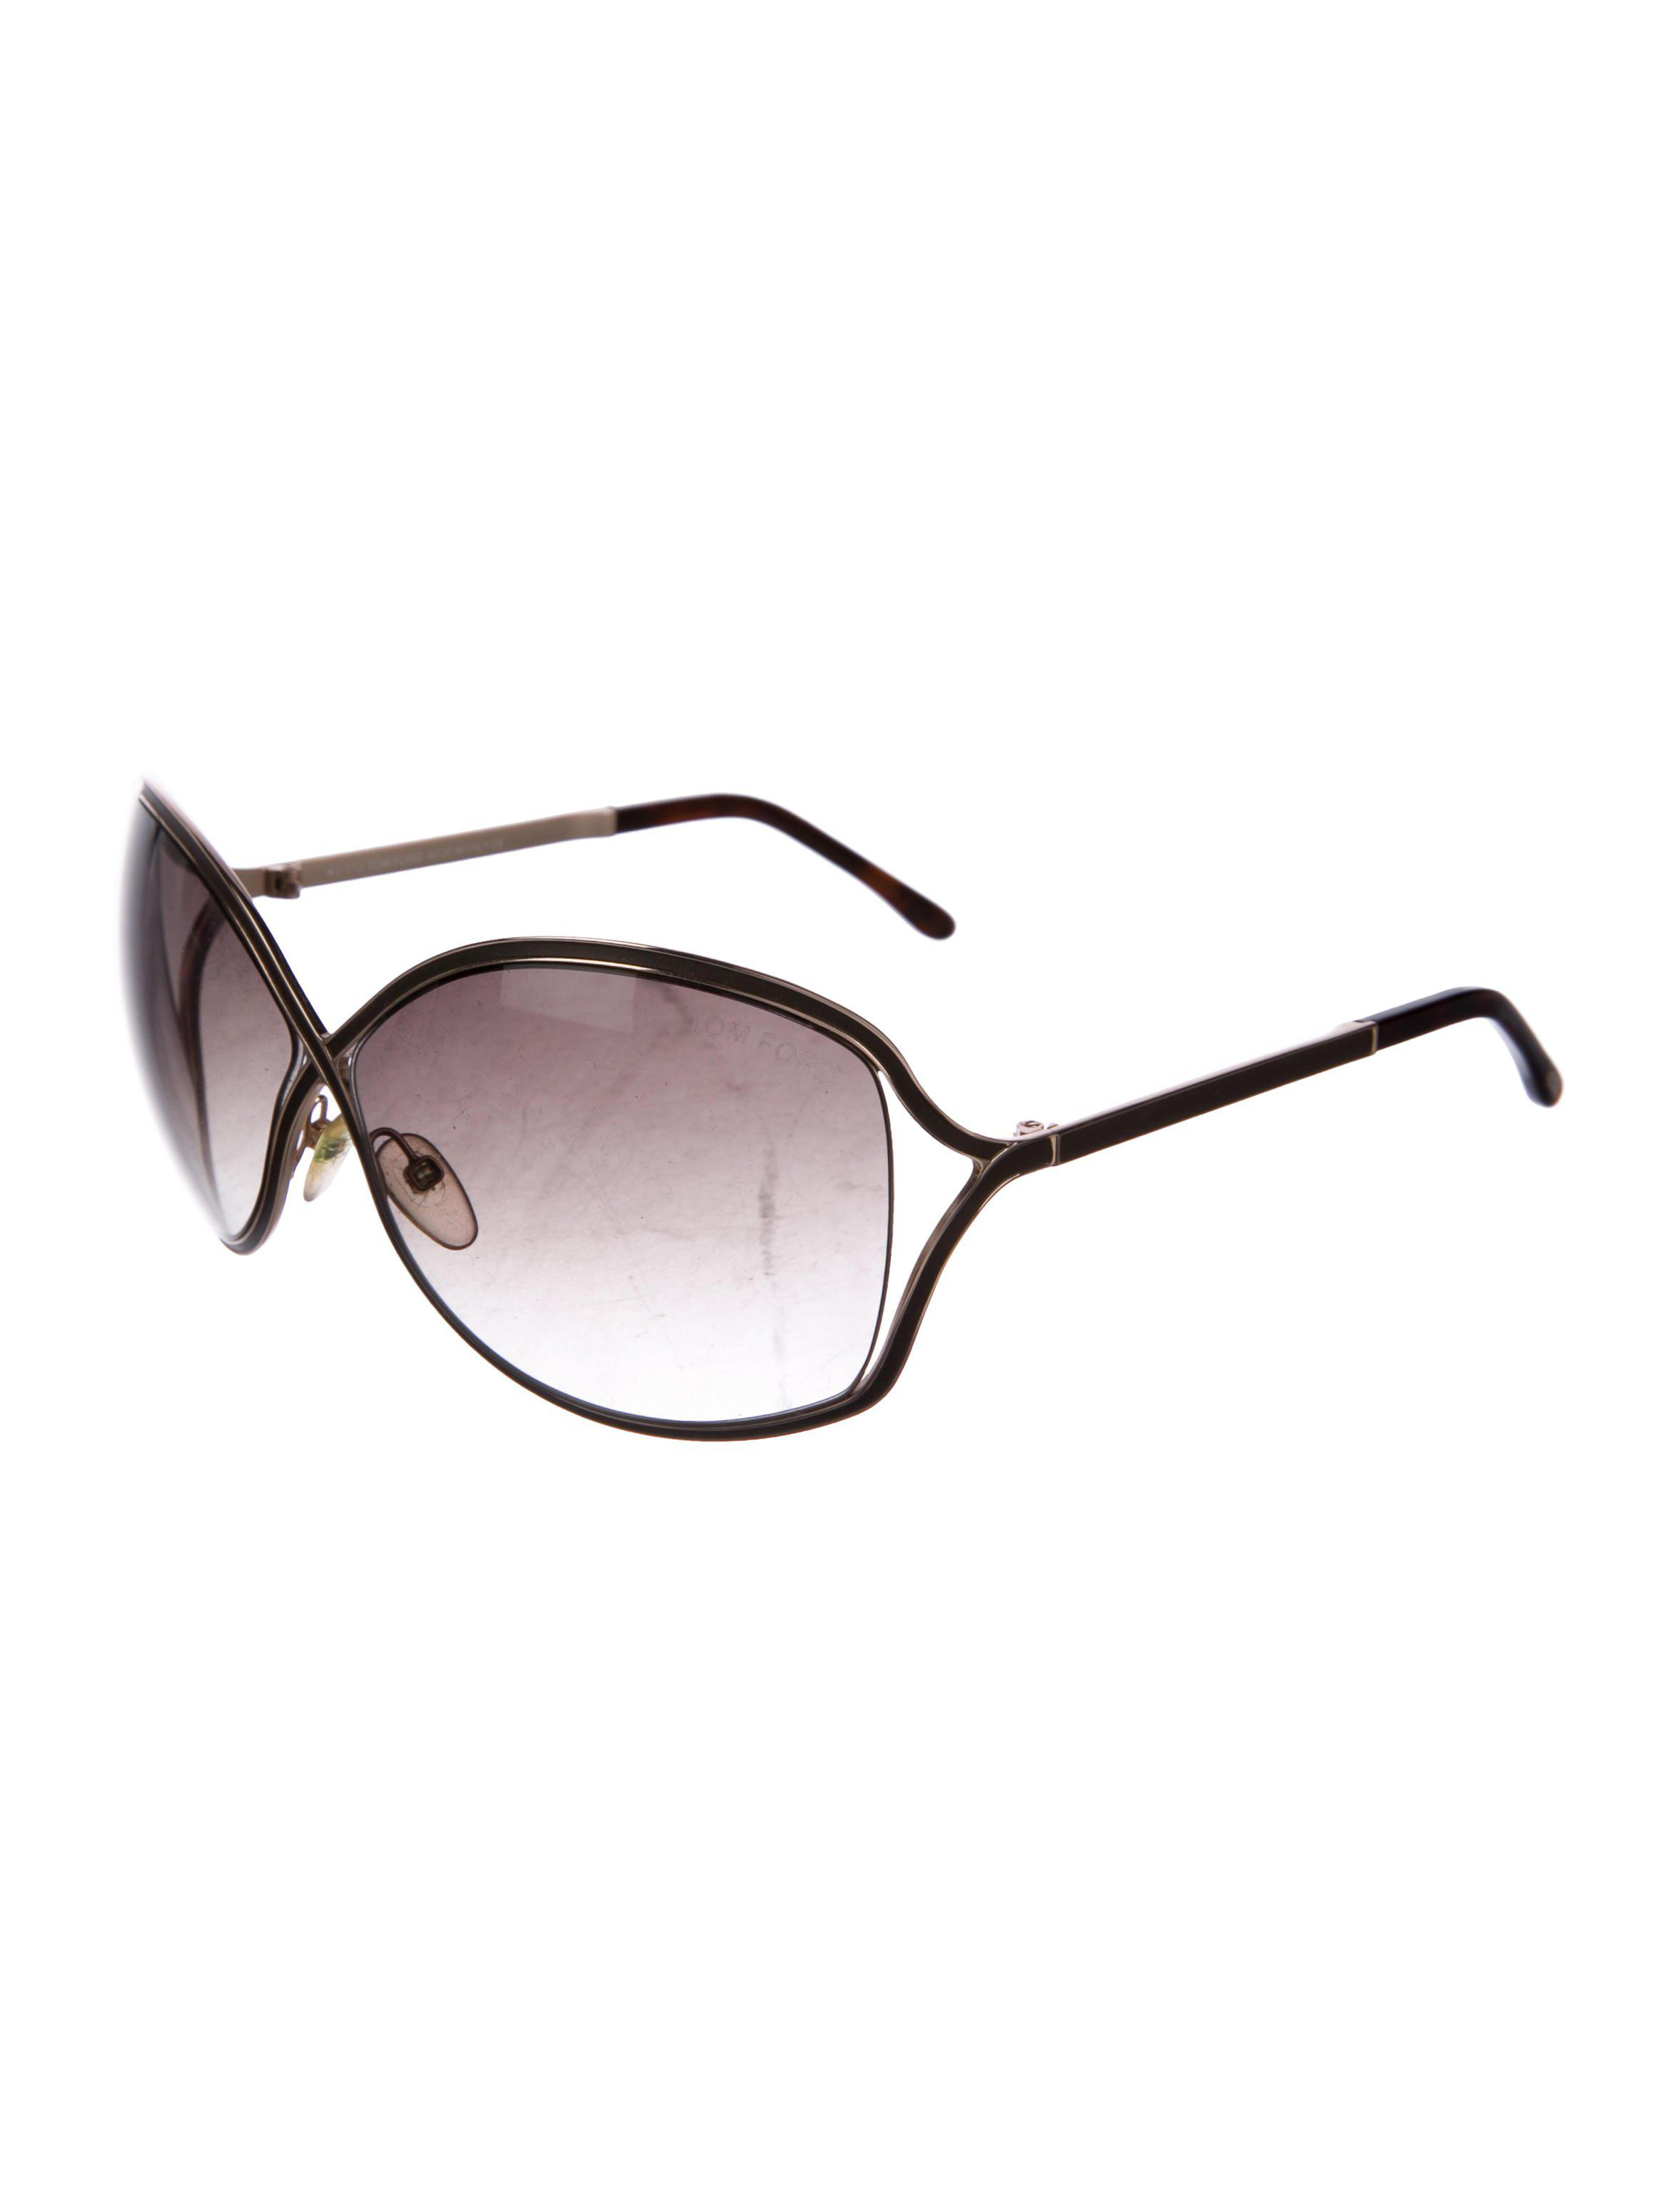 7d7925757c2cf Lyst - Tom Ford Rickie Gradient Sunglasses Gold in Metallic